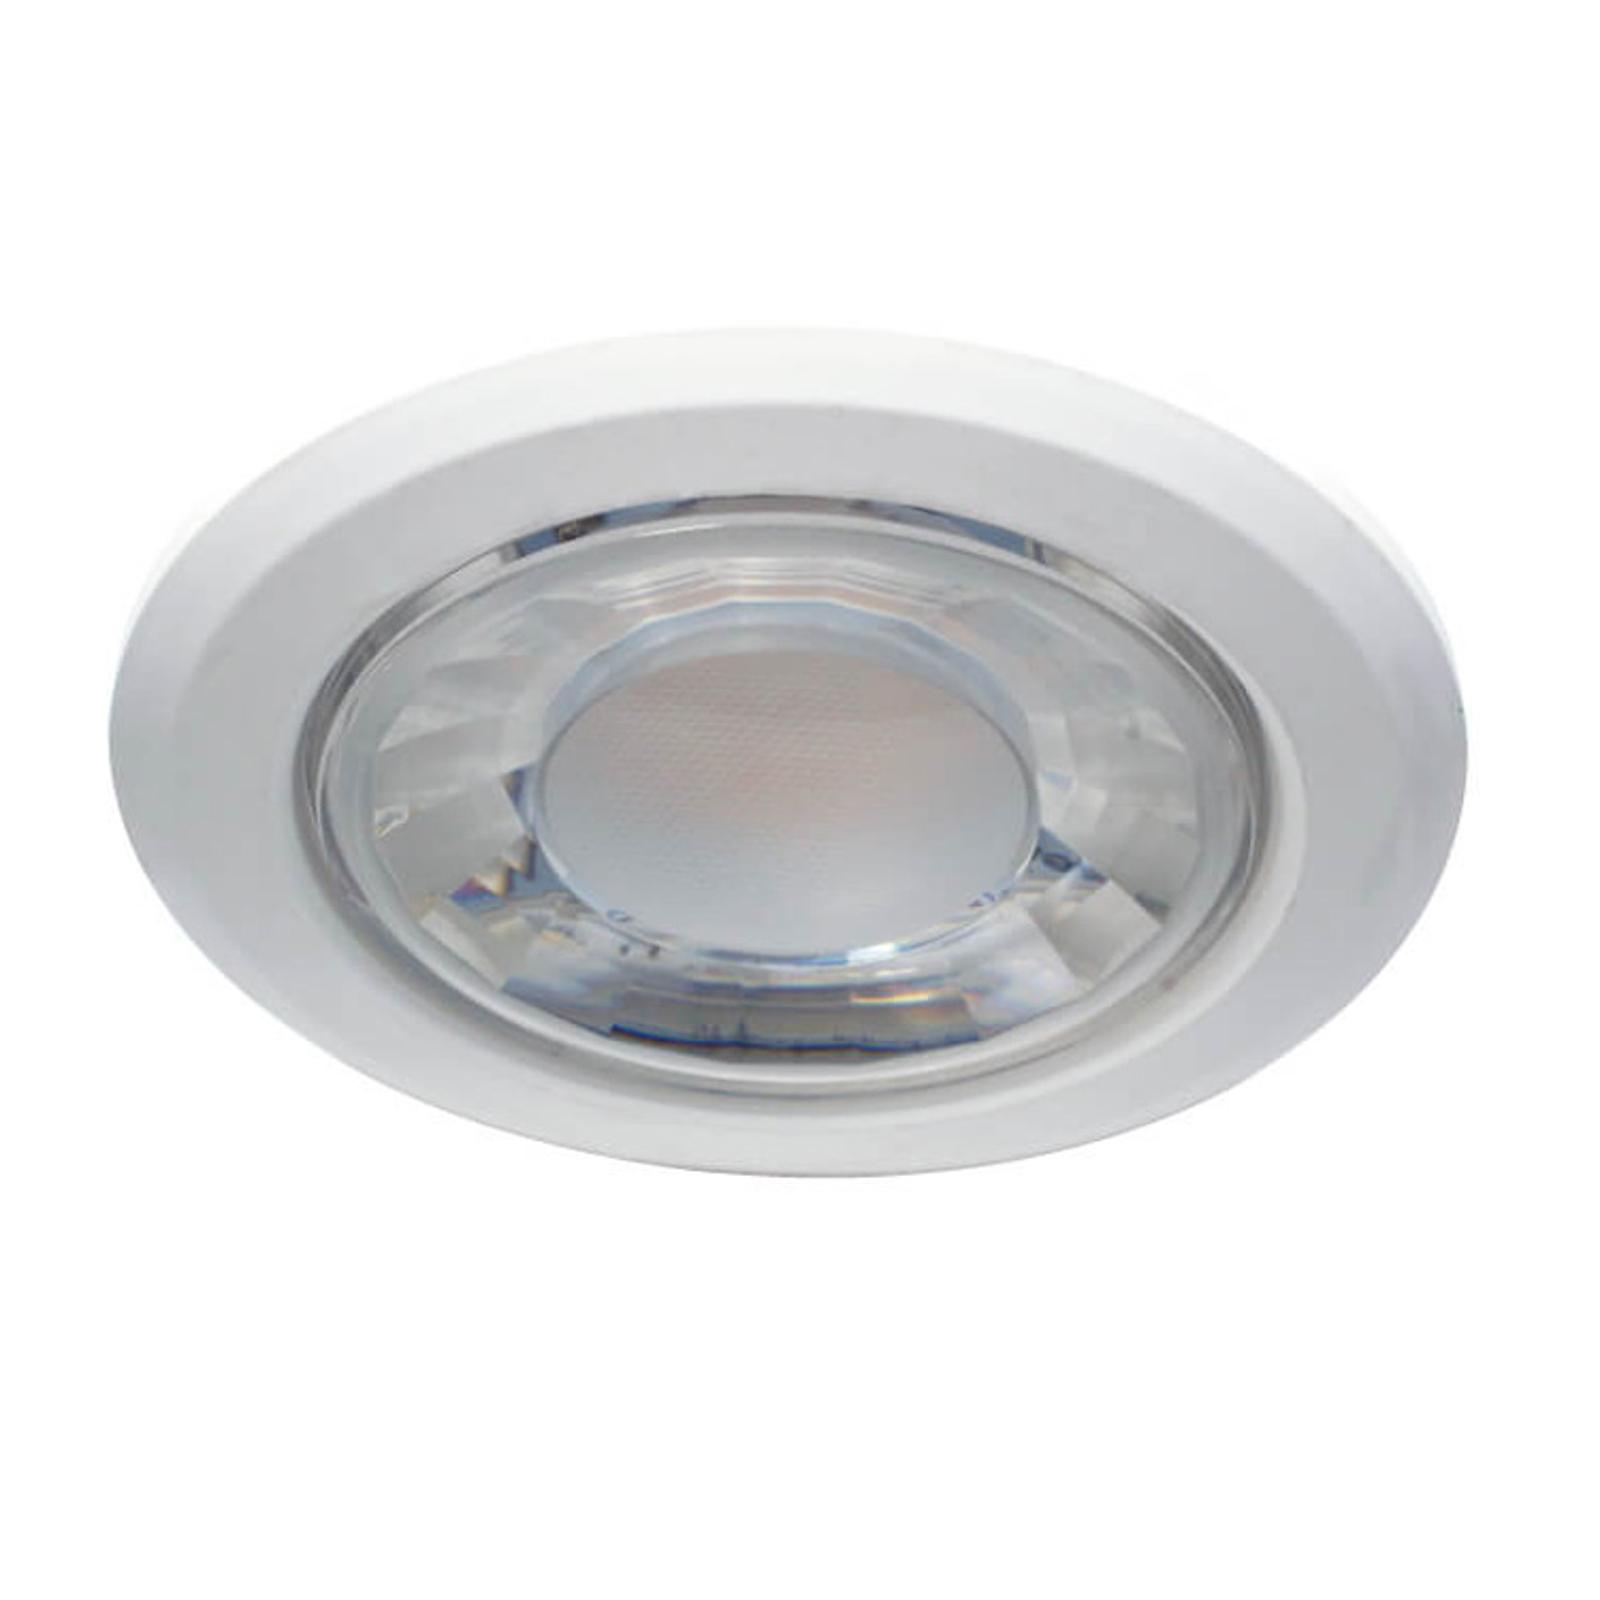 Dekto LED-spot, 10,5 cm, 60°, 15 W, 2.700 K